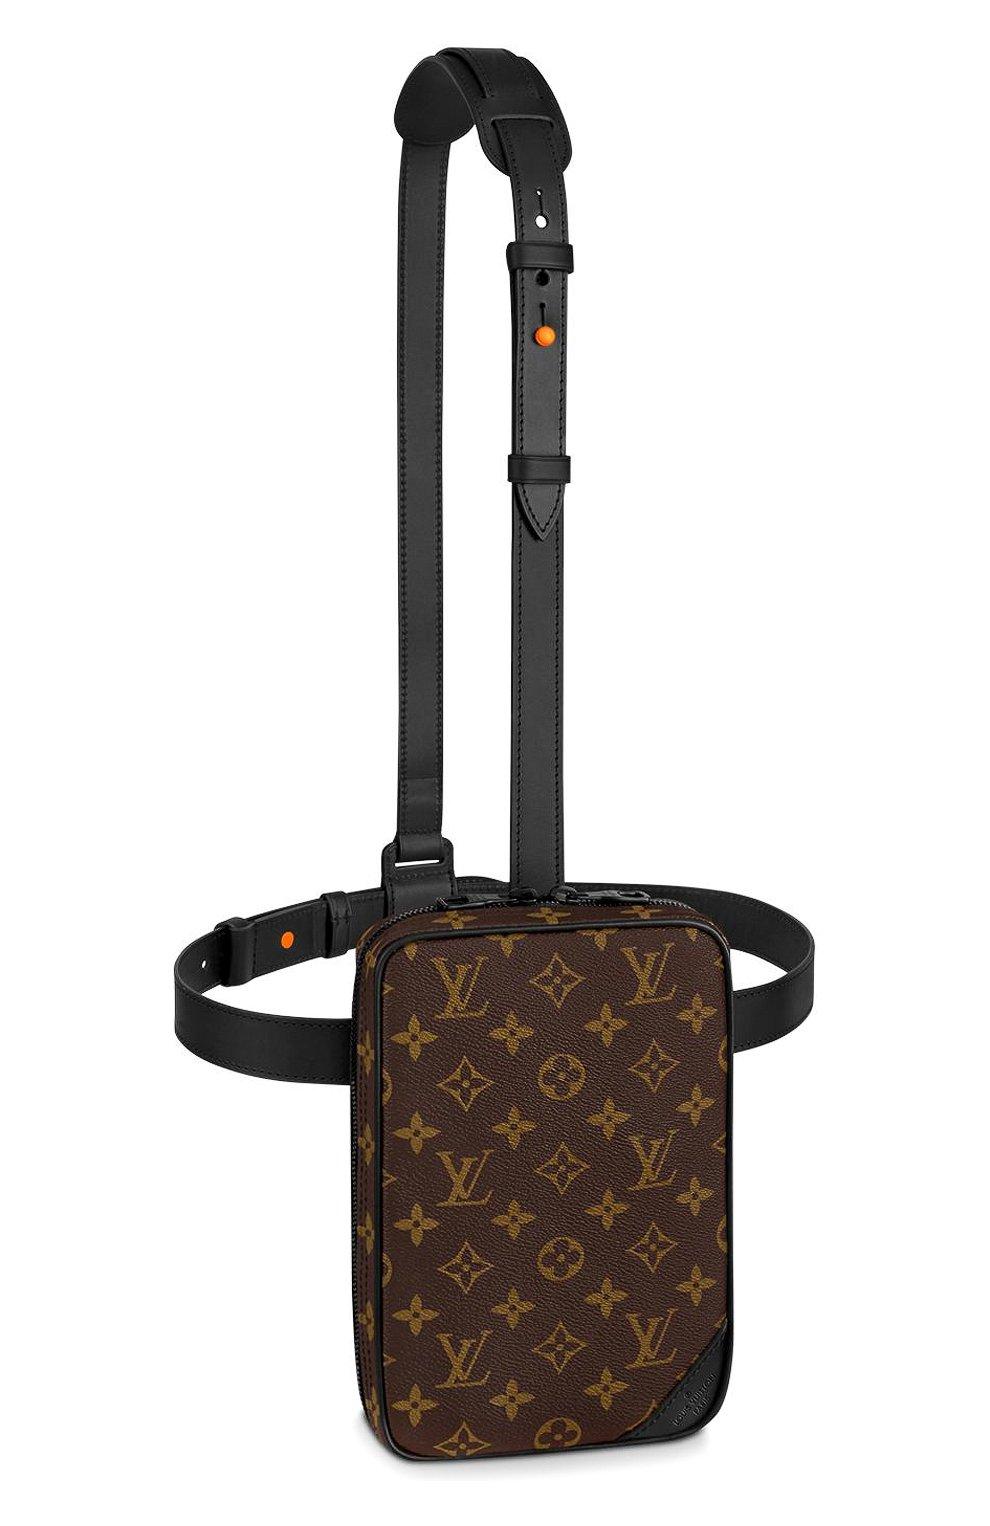 75206bc6b5b8 Мужская коричневая кожаная поясная сумка utility LOUIS VUITTON ...